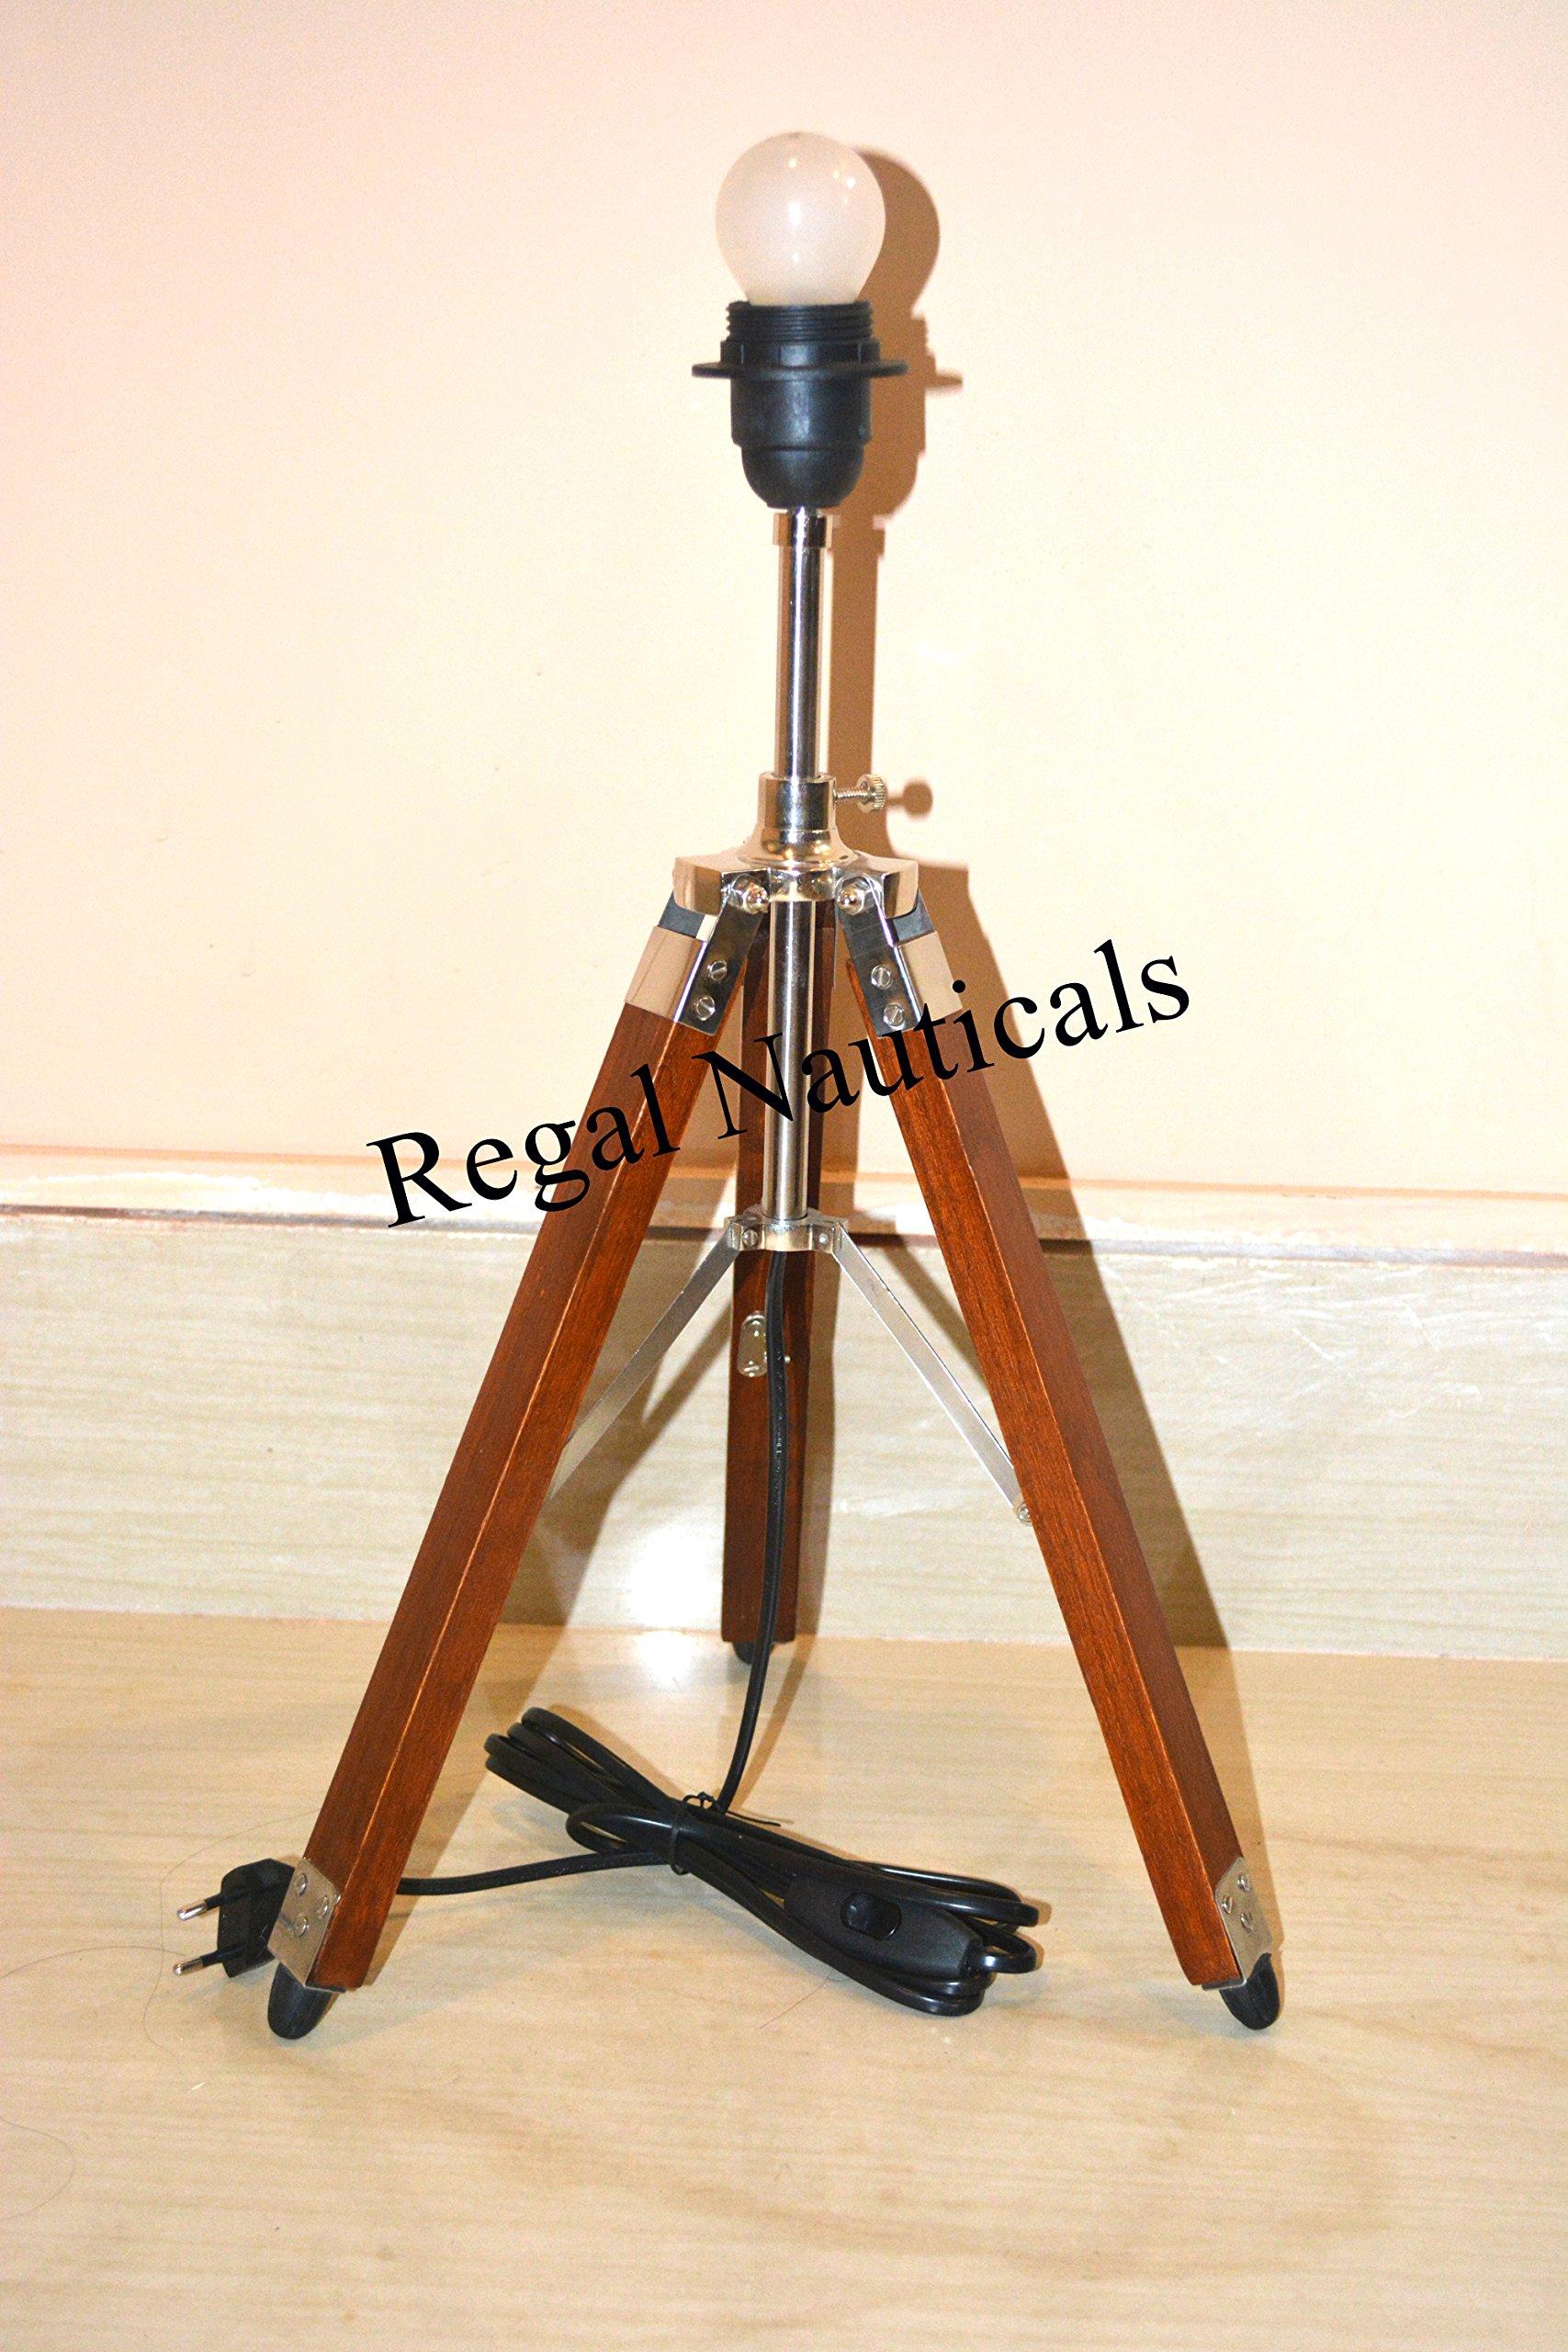 MODERN WOOD LAMPSHADE TRIPOD STAND ROYAL DESIGNER NAUTICAL TRIPOD TABLE LAMP